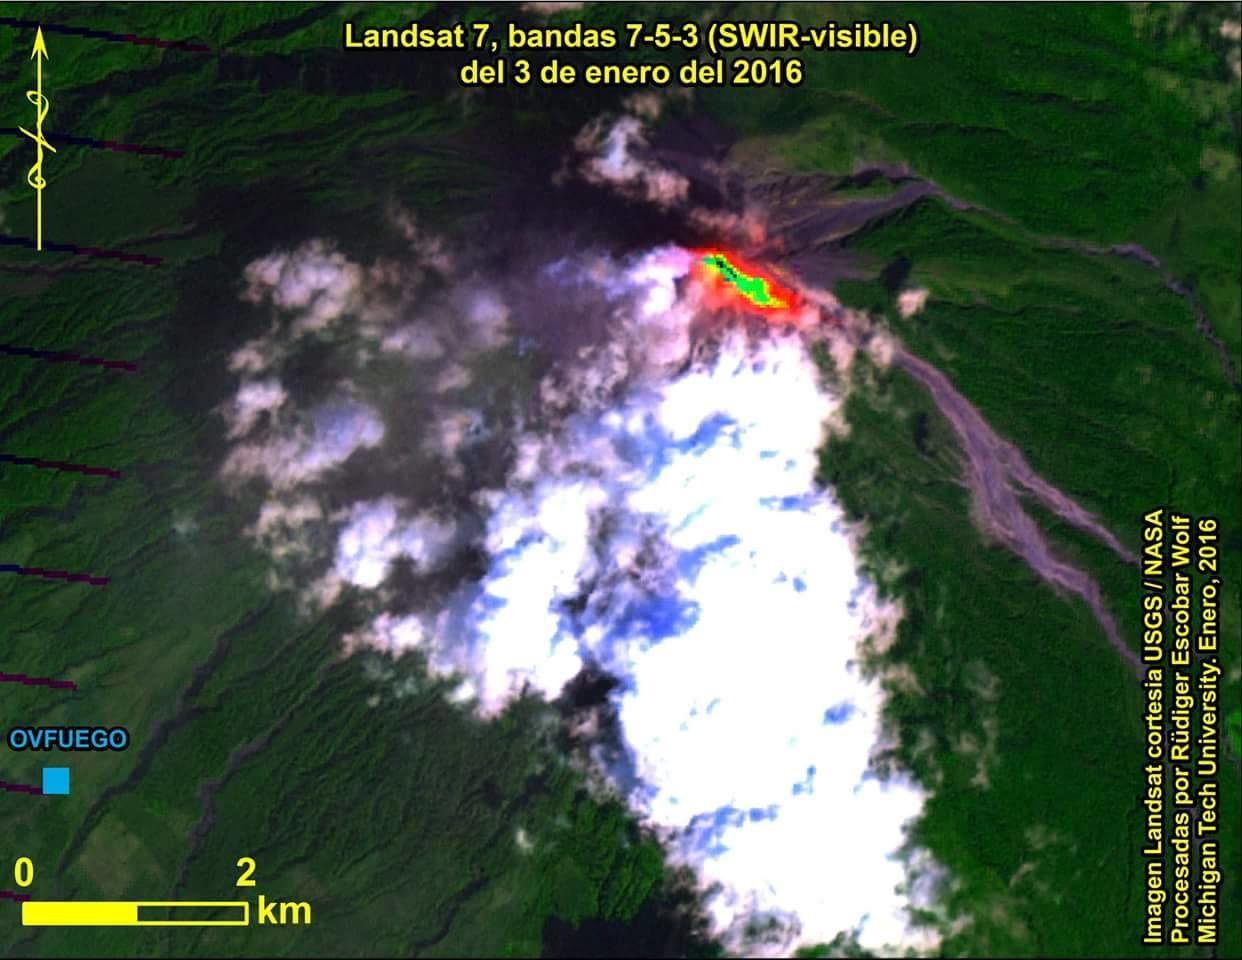 Fuego - Landsat 7 bands 7-5-3 (Visible-SWIR) of 01.03.2016